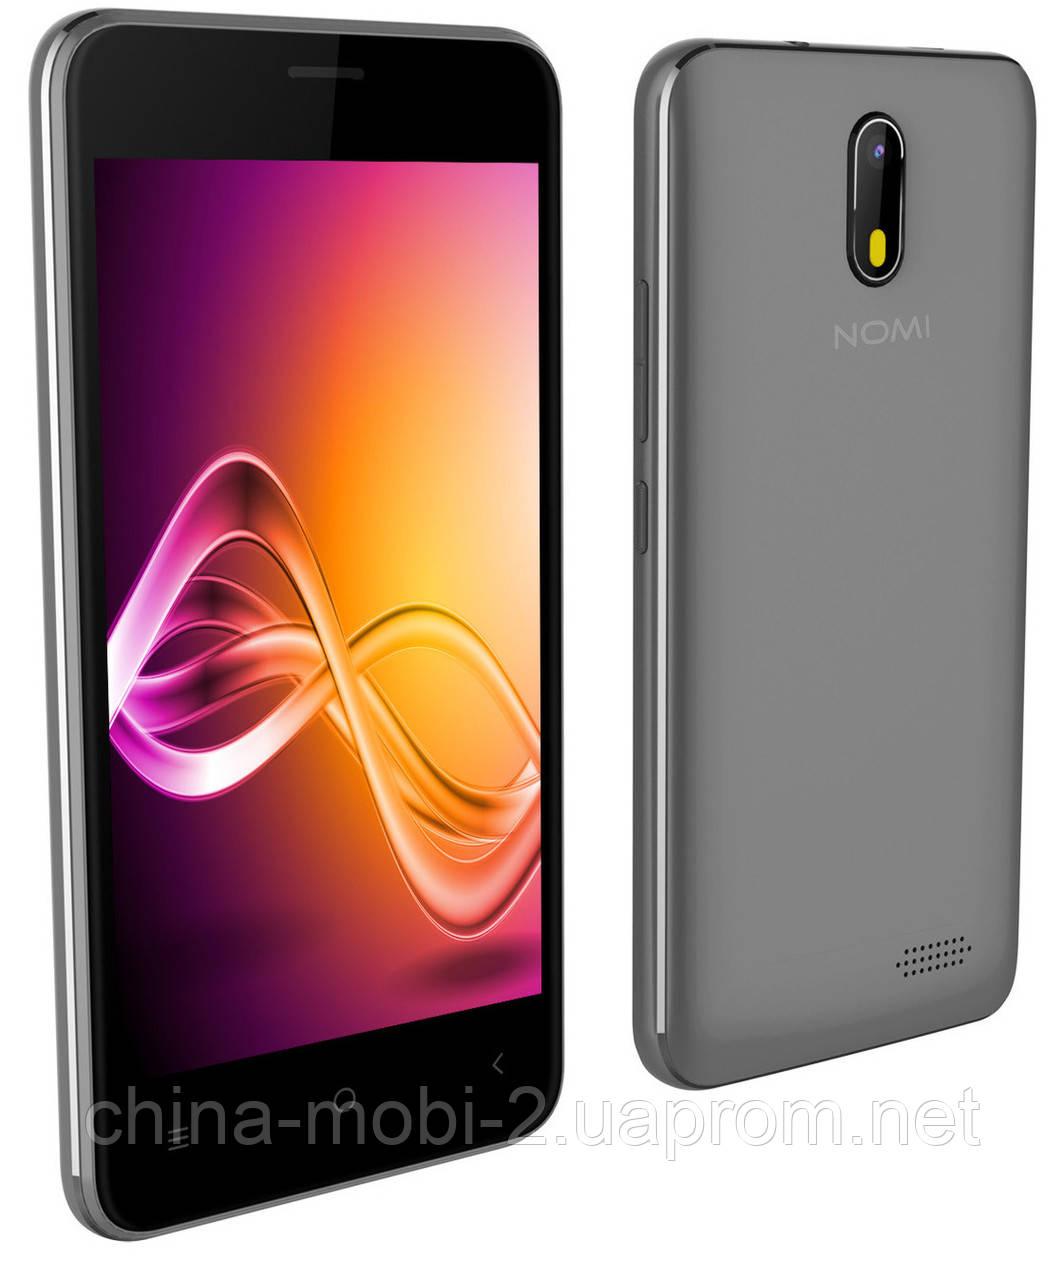 Смартфон Nomi i4500 BEAT M1 Grey